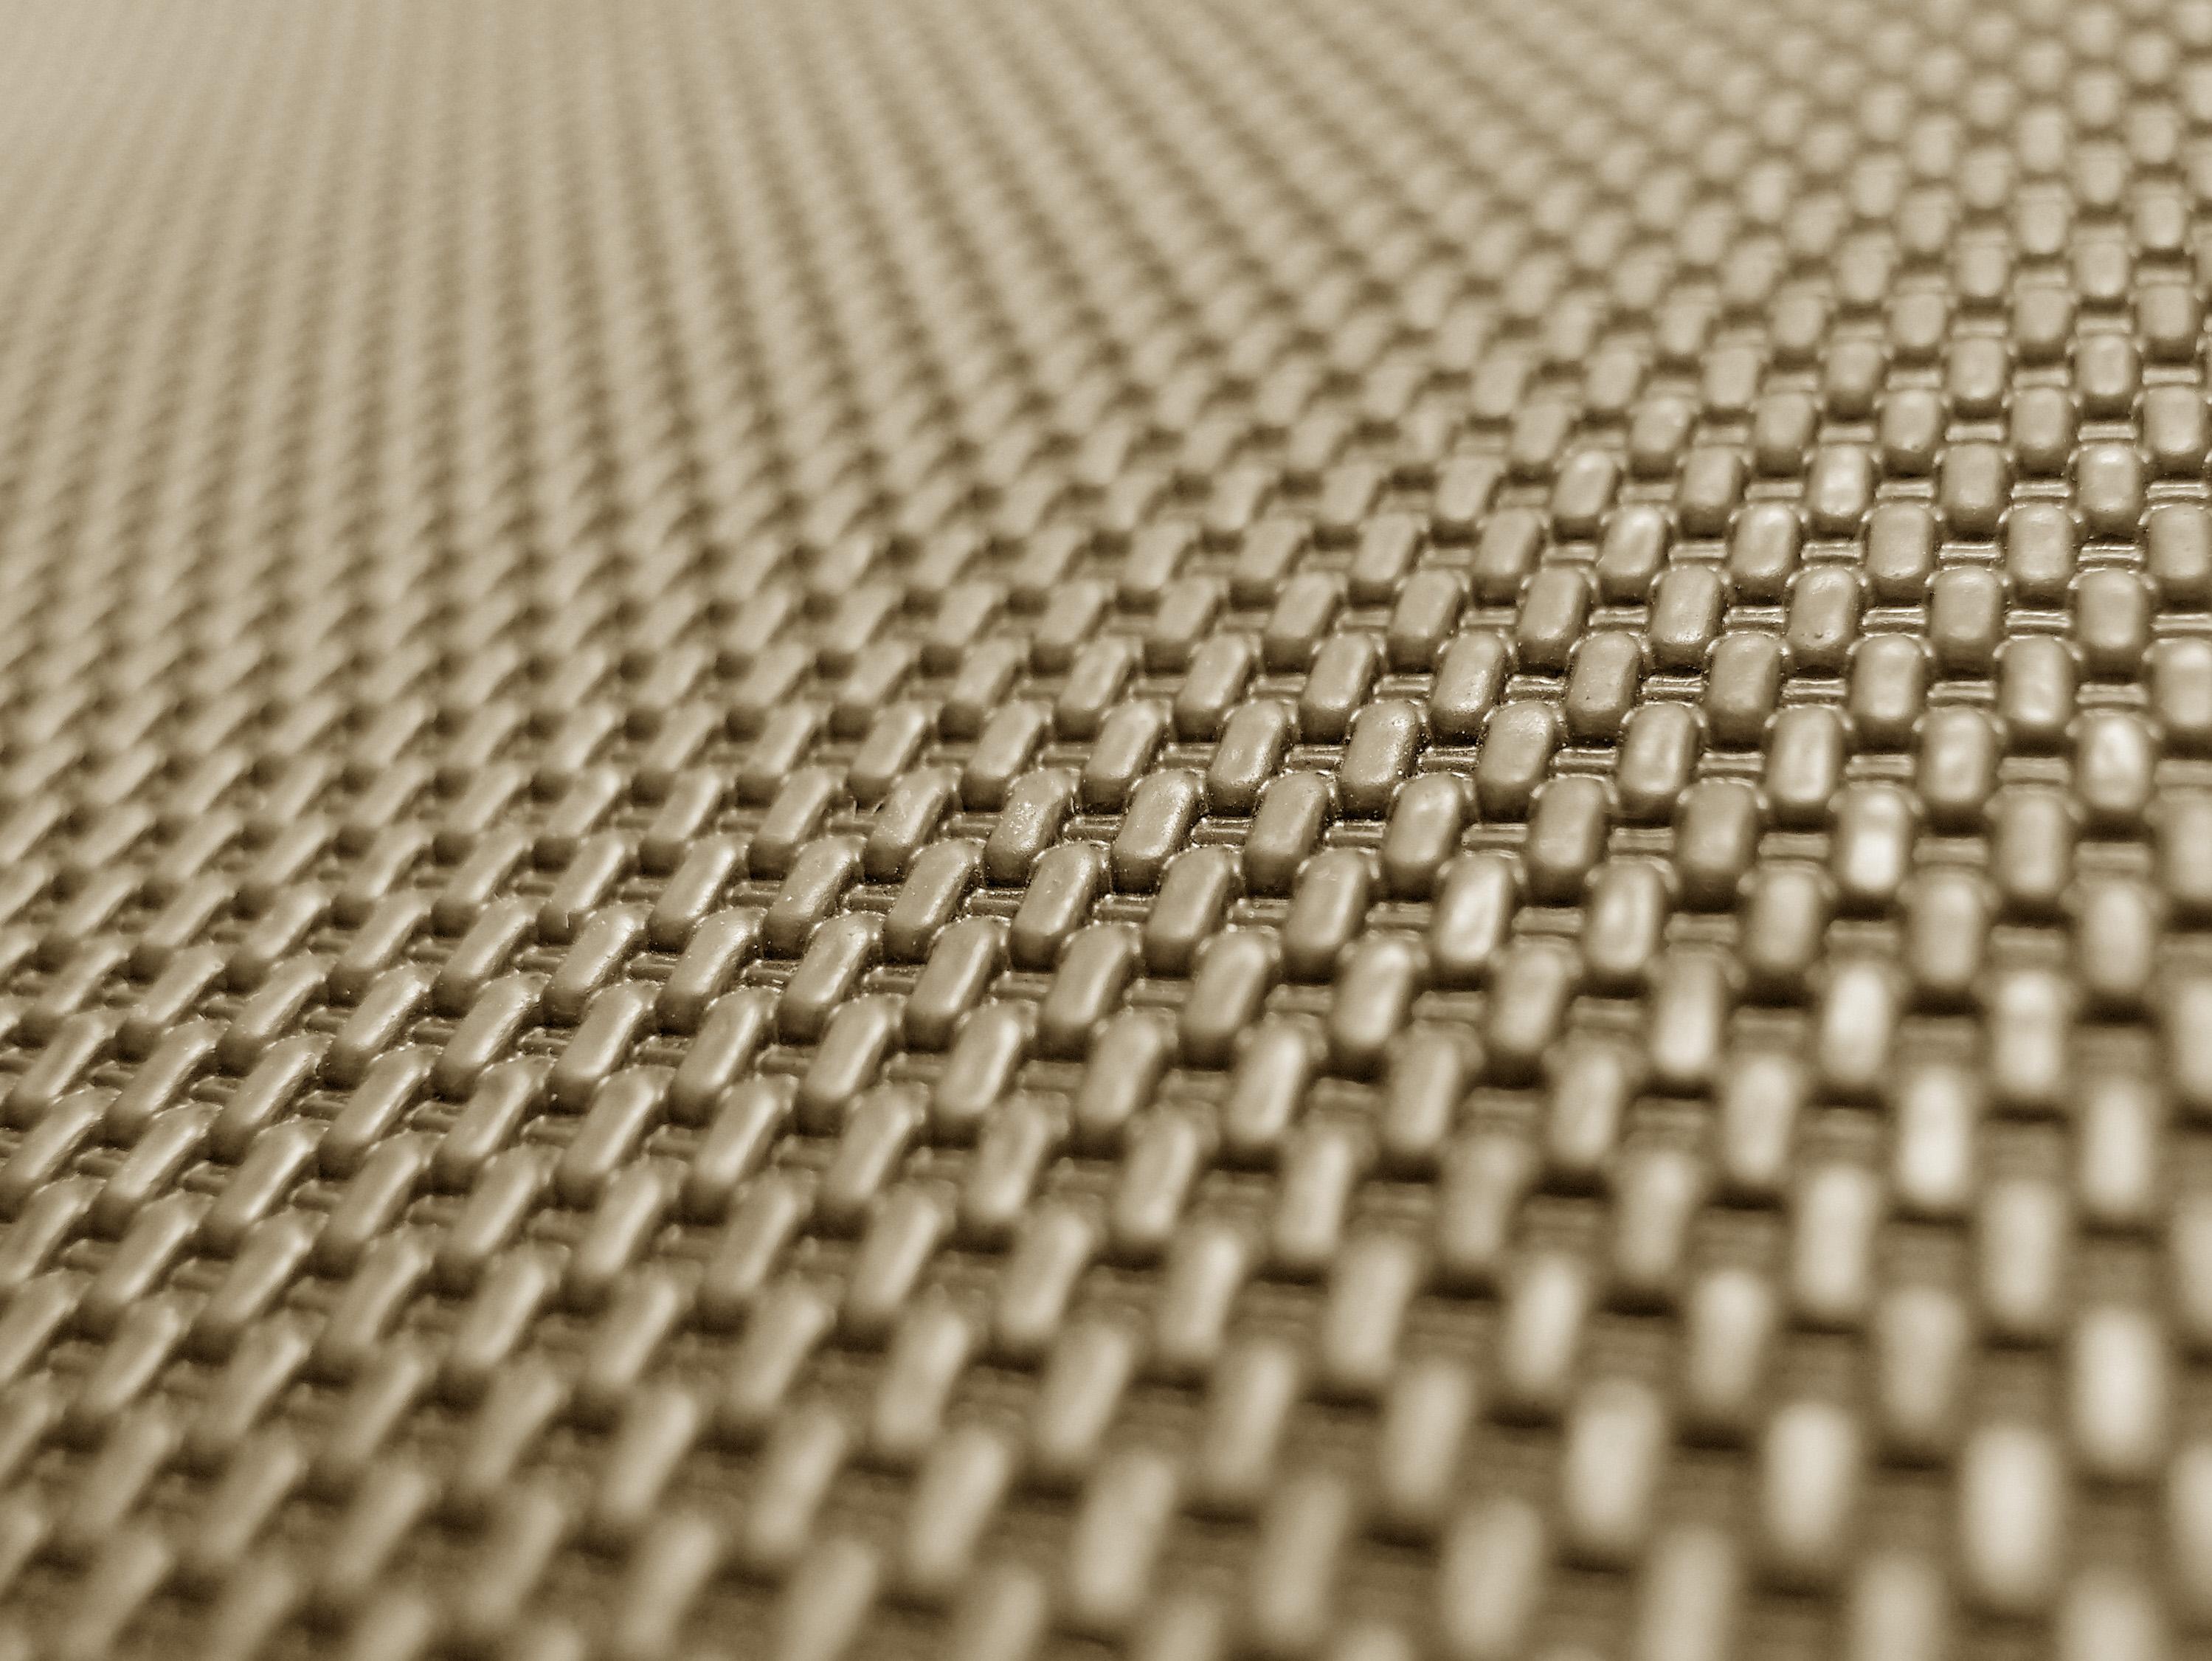 Rubber floor mats lexus rx330 - Click Thumbnails To Enlarge